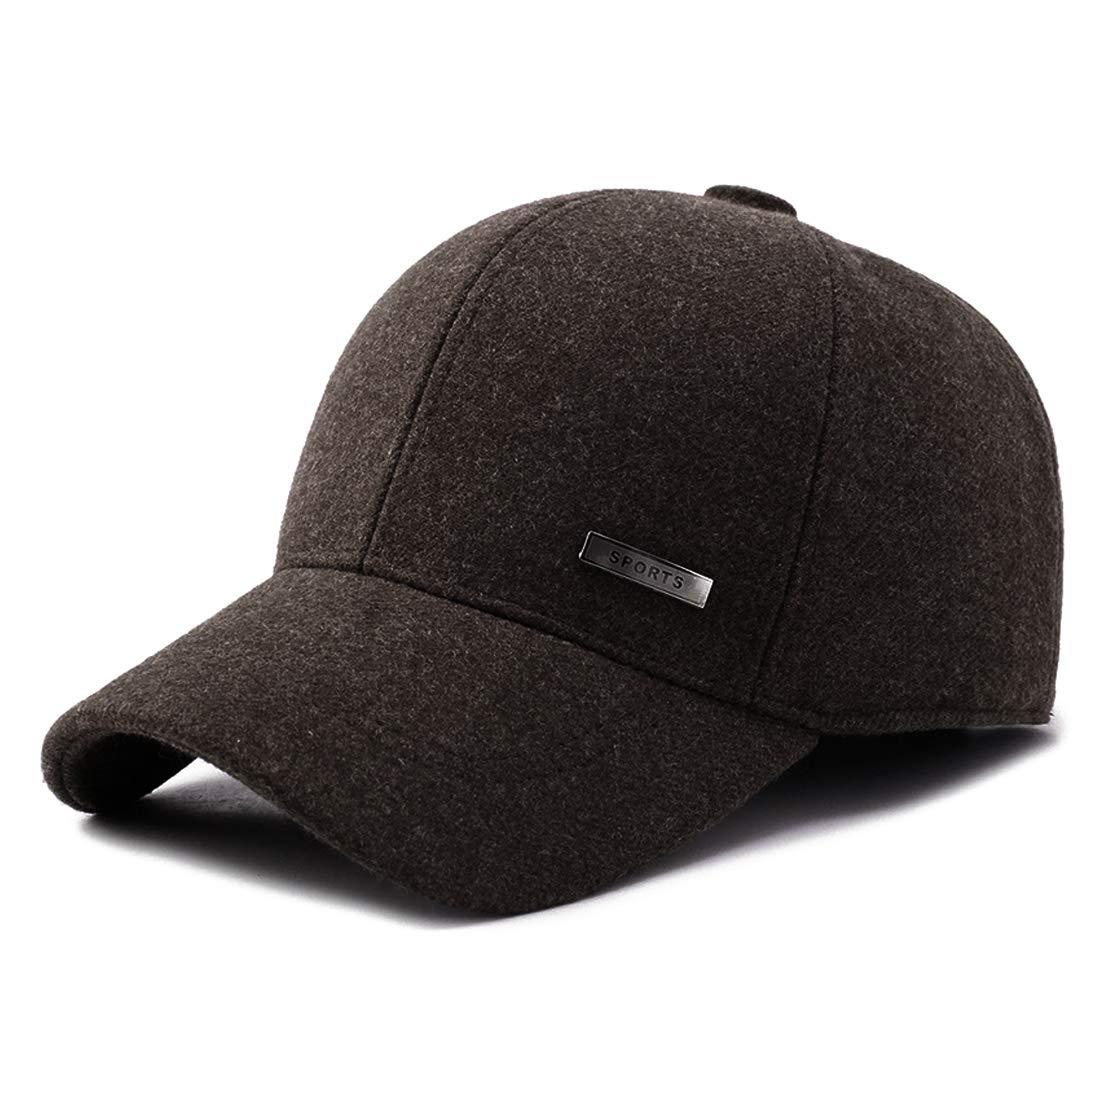 Gisdanchz 22-23 1/2 / 56-60cm Men's Winter Warm Baseball Cap with Ear Flap and Metal Buckle